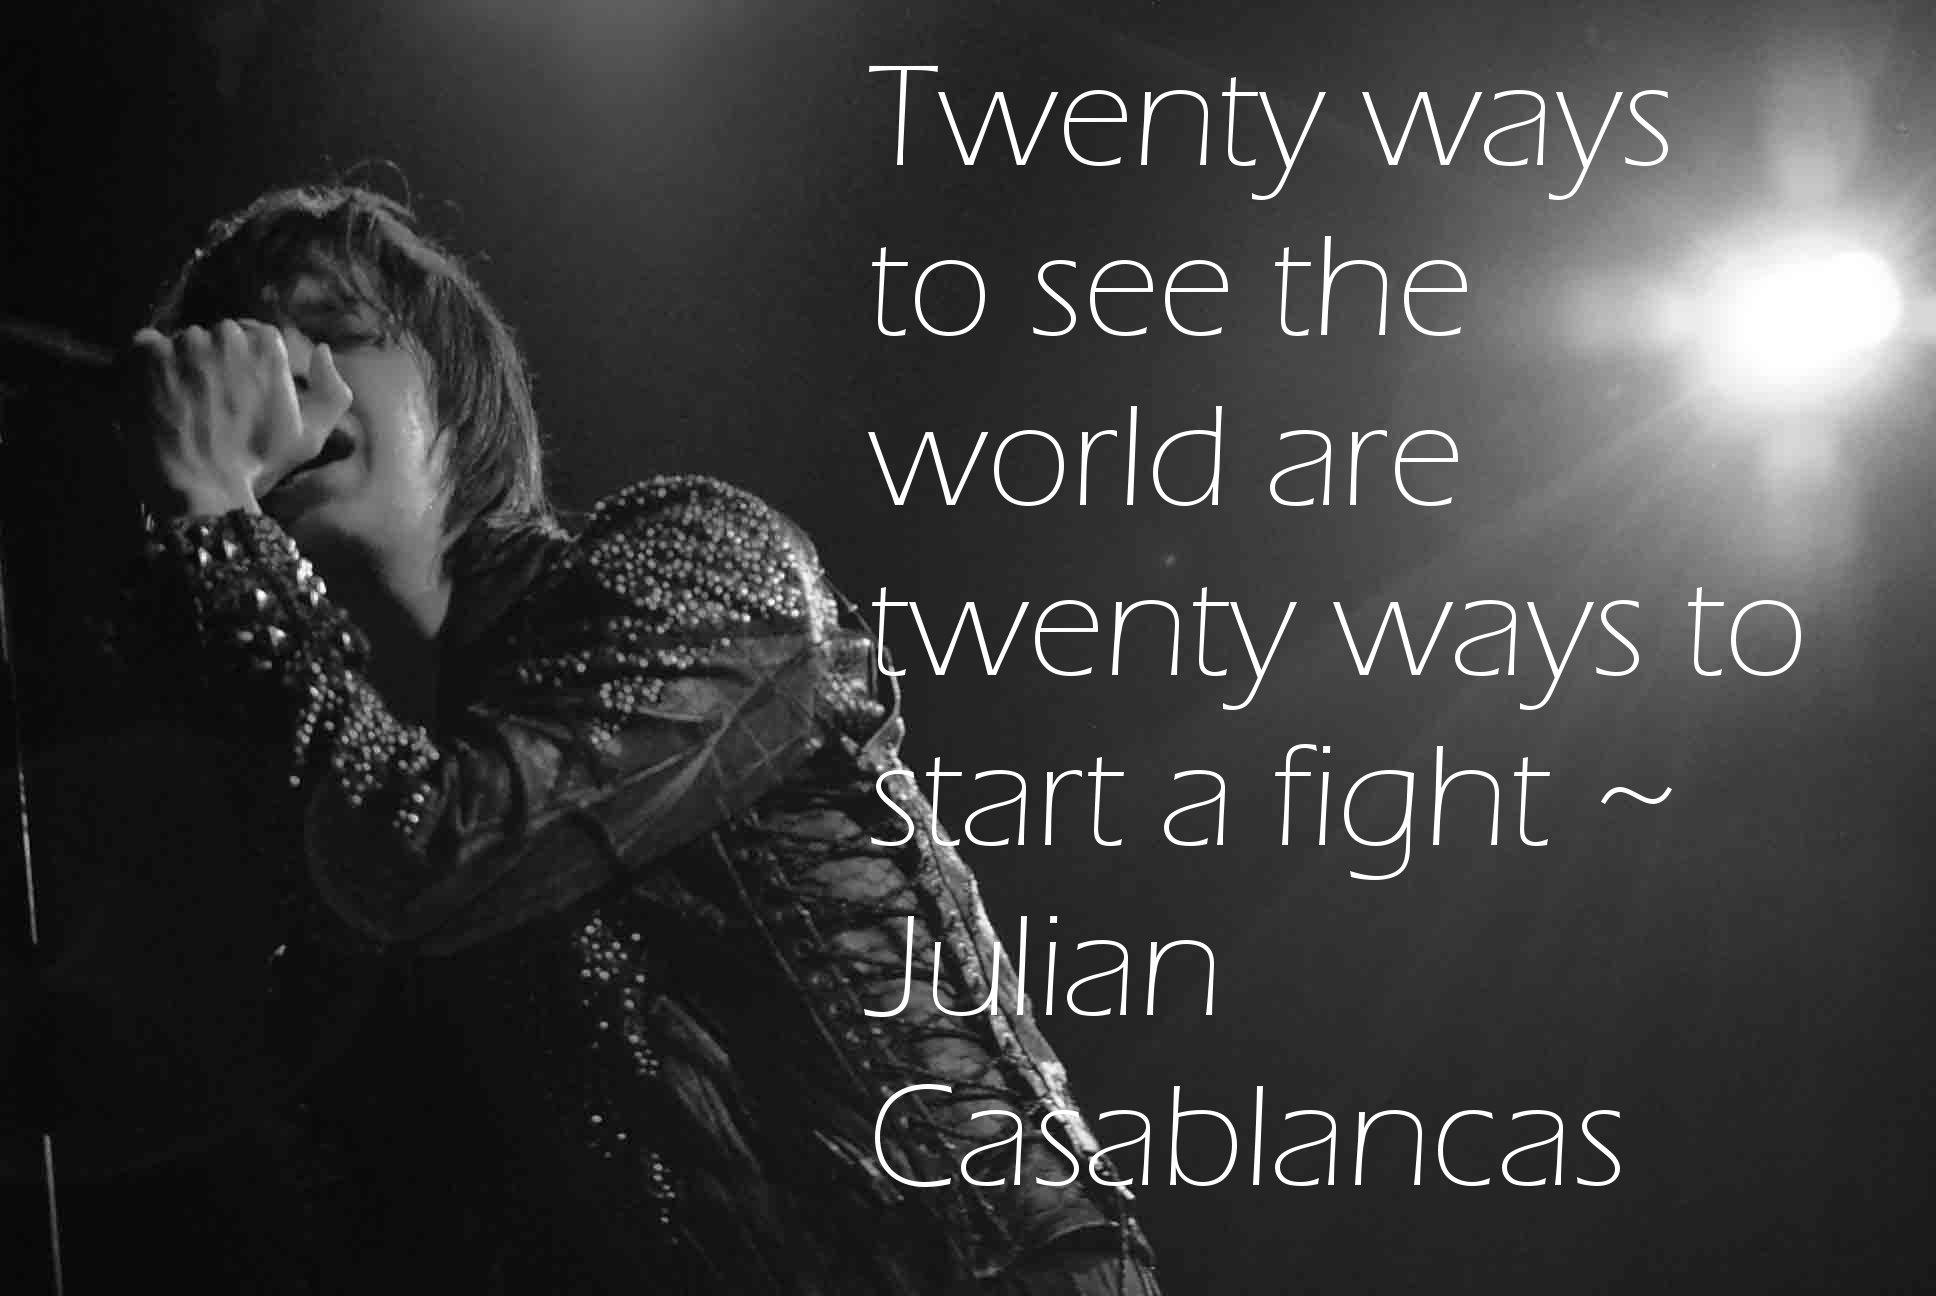 Julian Casablancas Quotes Be Nice. QuotesGram